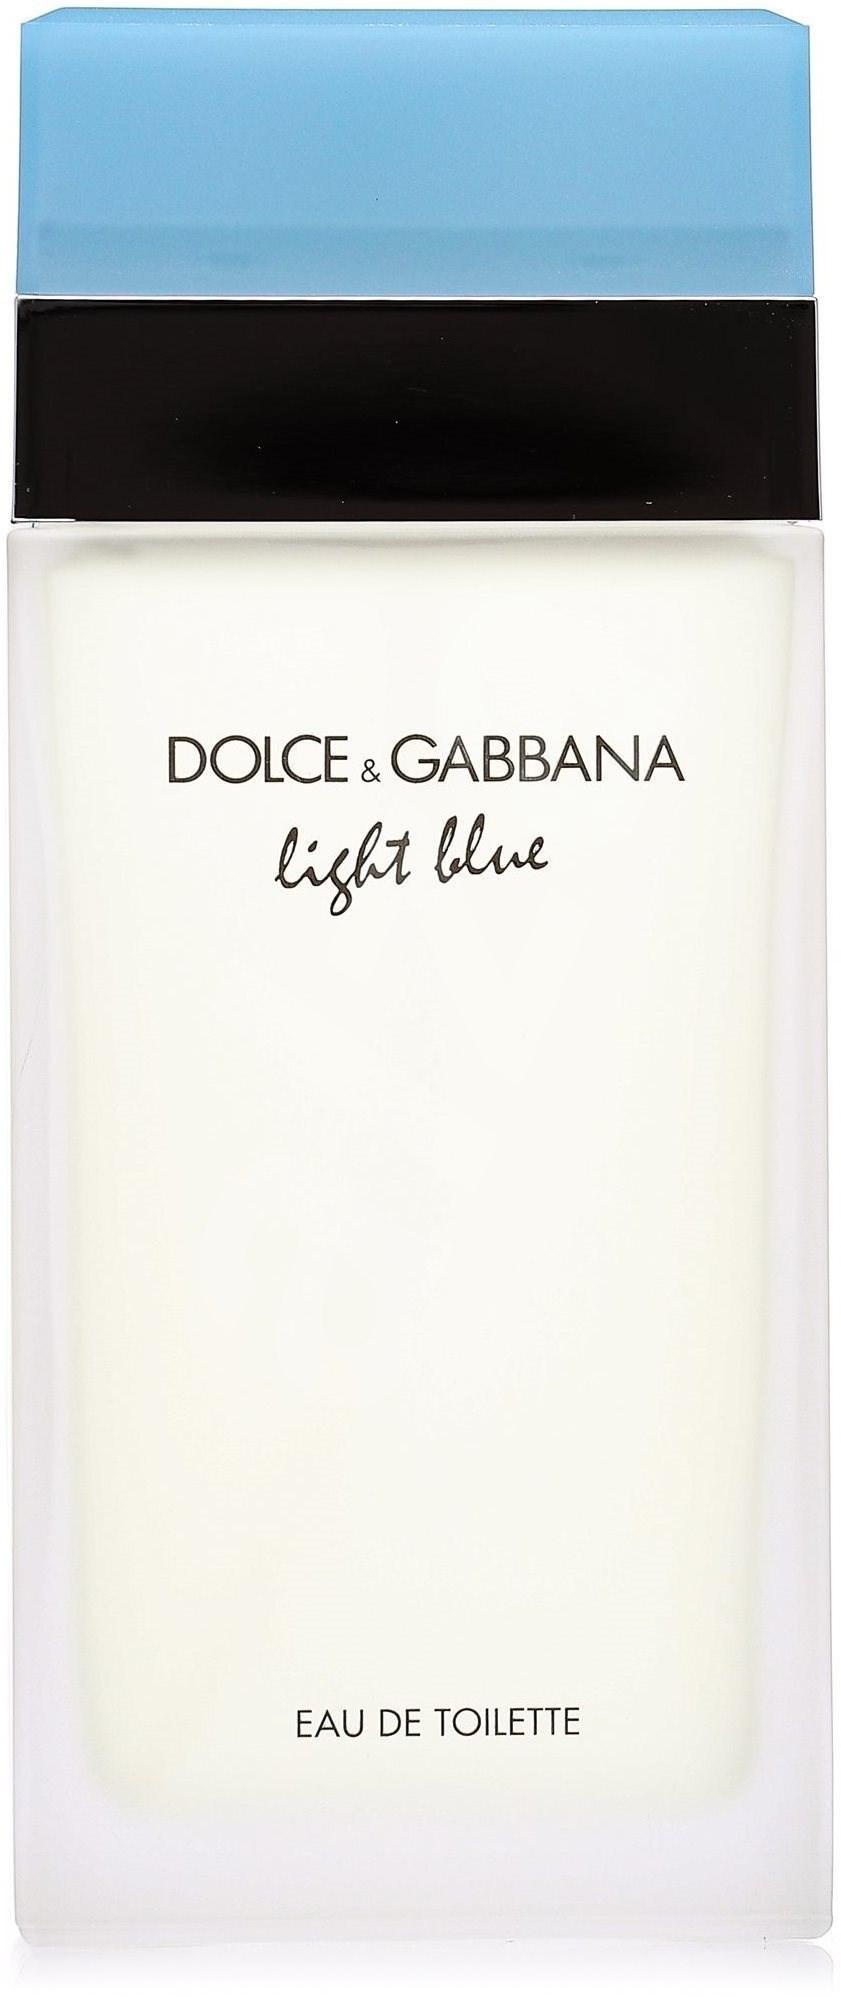 dolce gabbana light blue 50 ml eau de toilette trendy. Black Bedroom Furniture Sets. Home Design Ideas